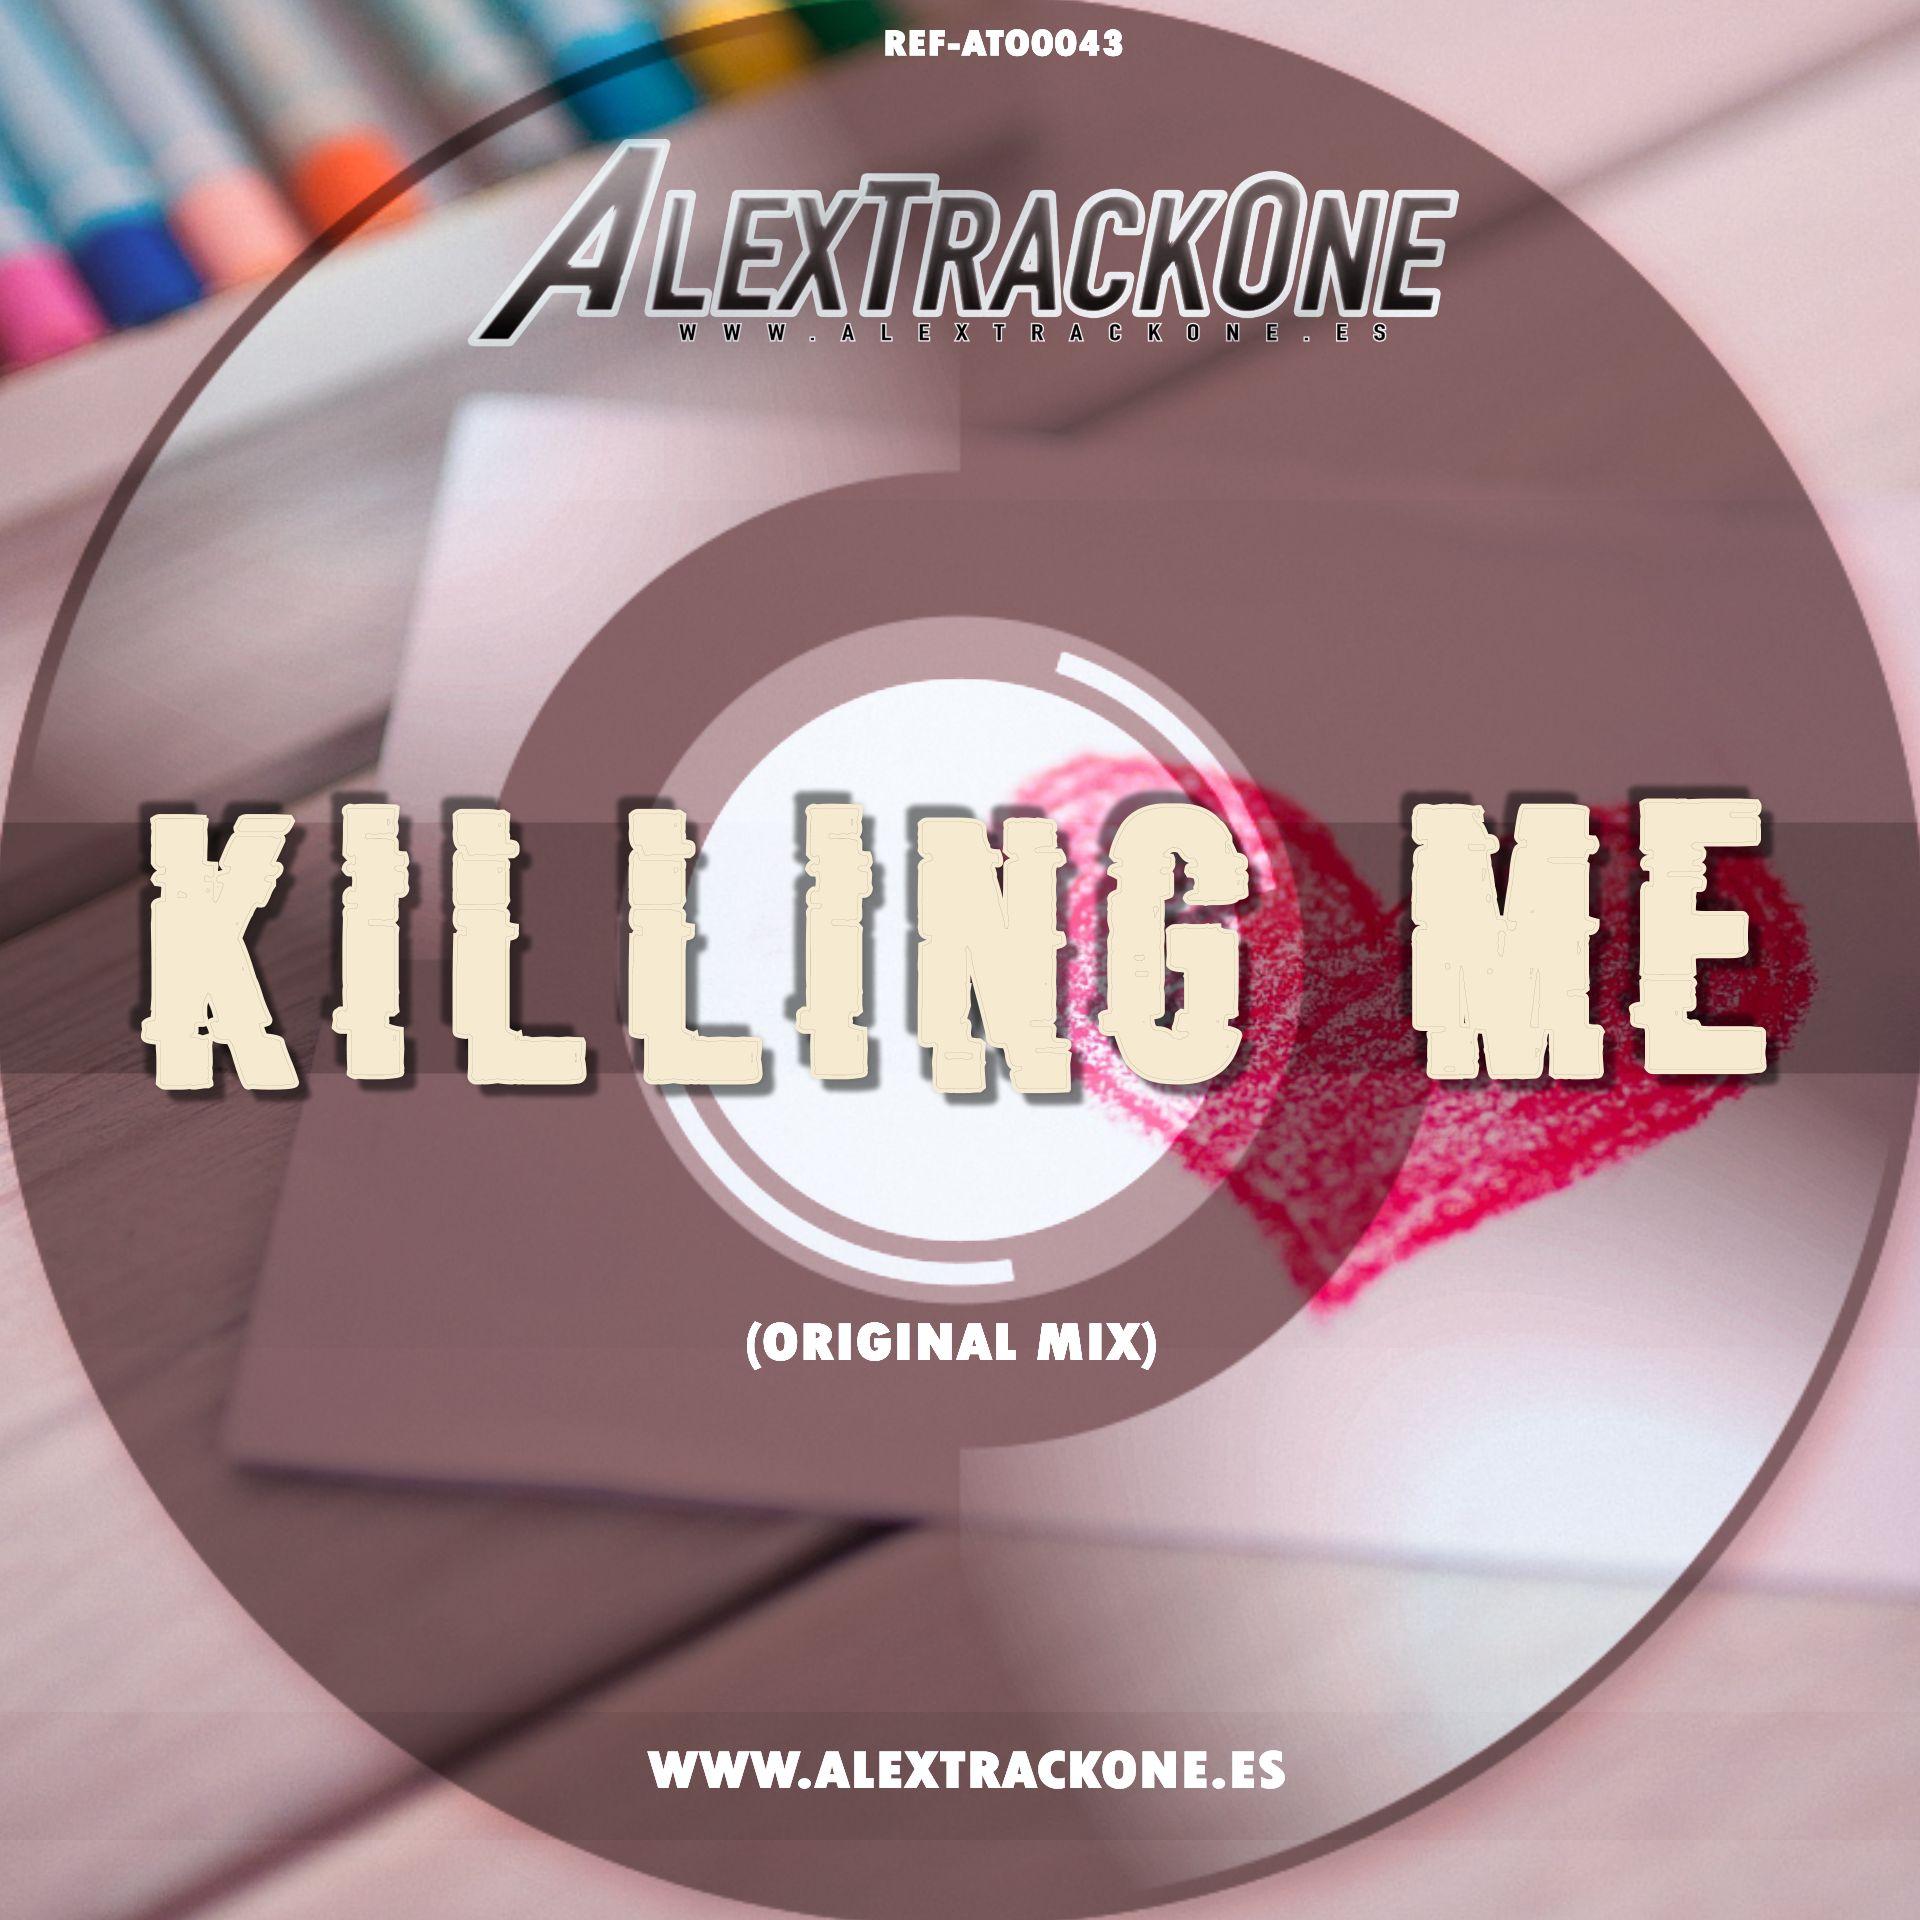 REF-ATO0043 KILLING ME (ORIGINAL MIX) (MP3 & WAV)